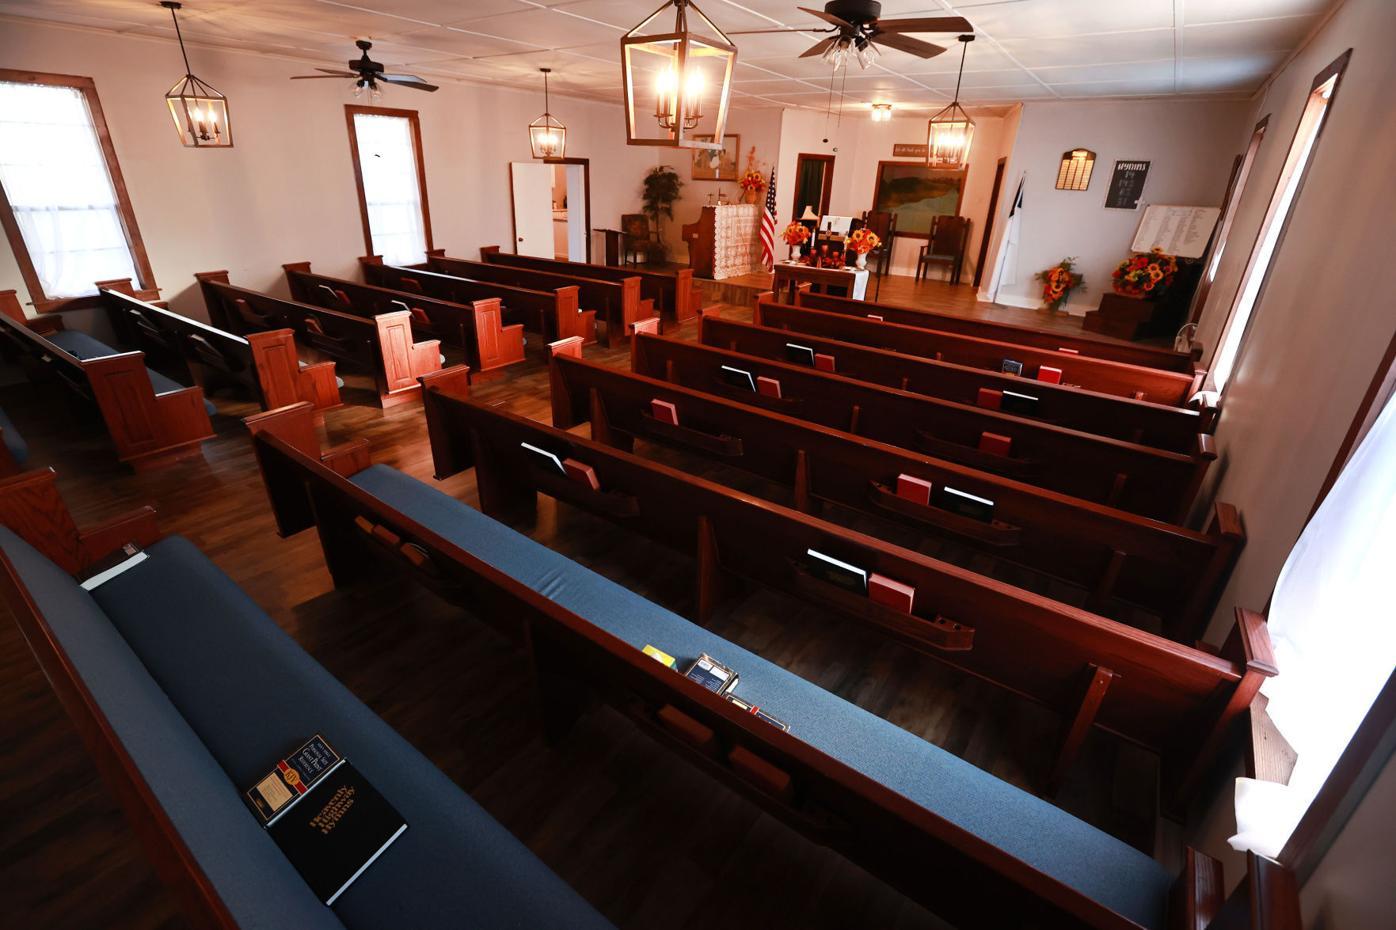 djr-2021-10-13-news-new-hope-church-arp3